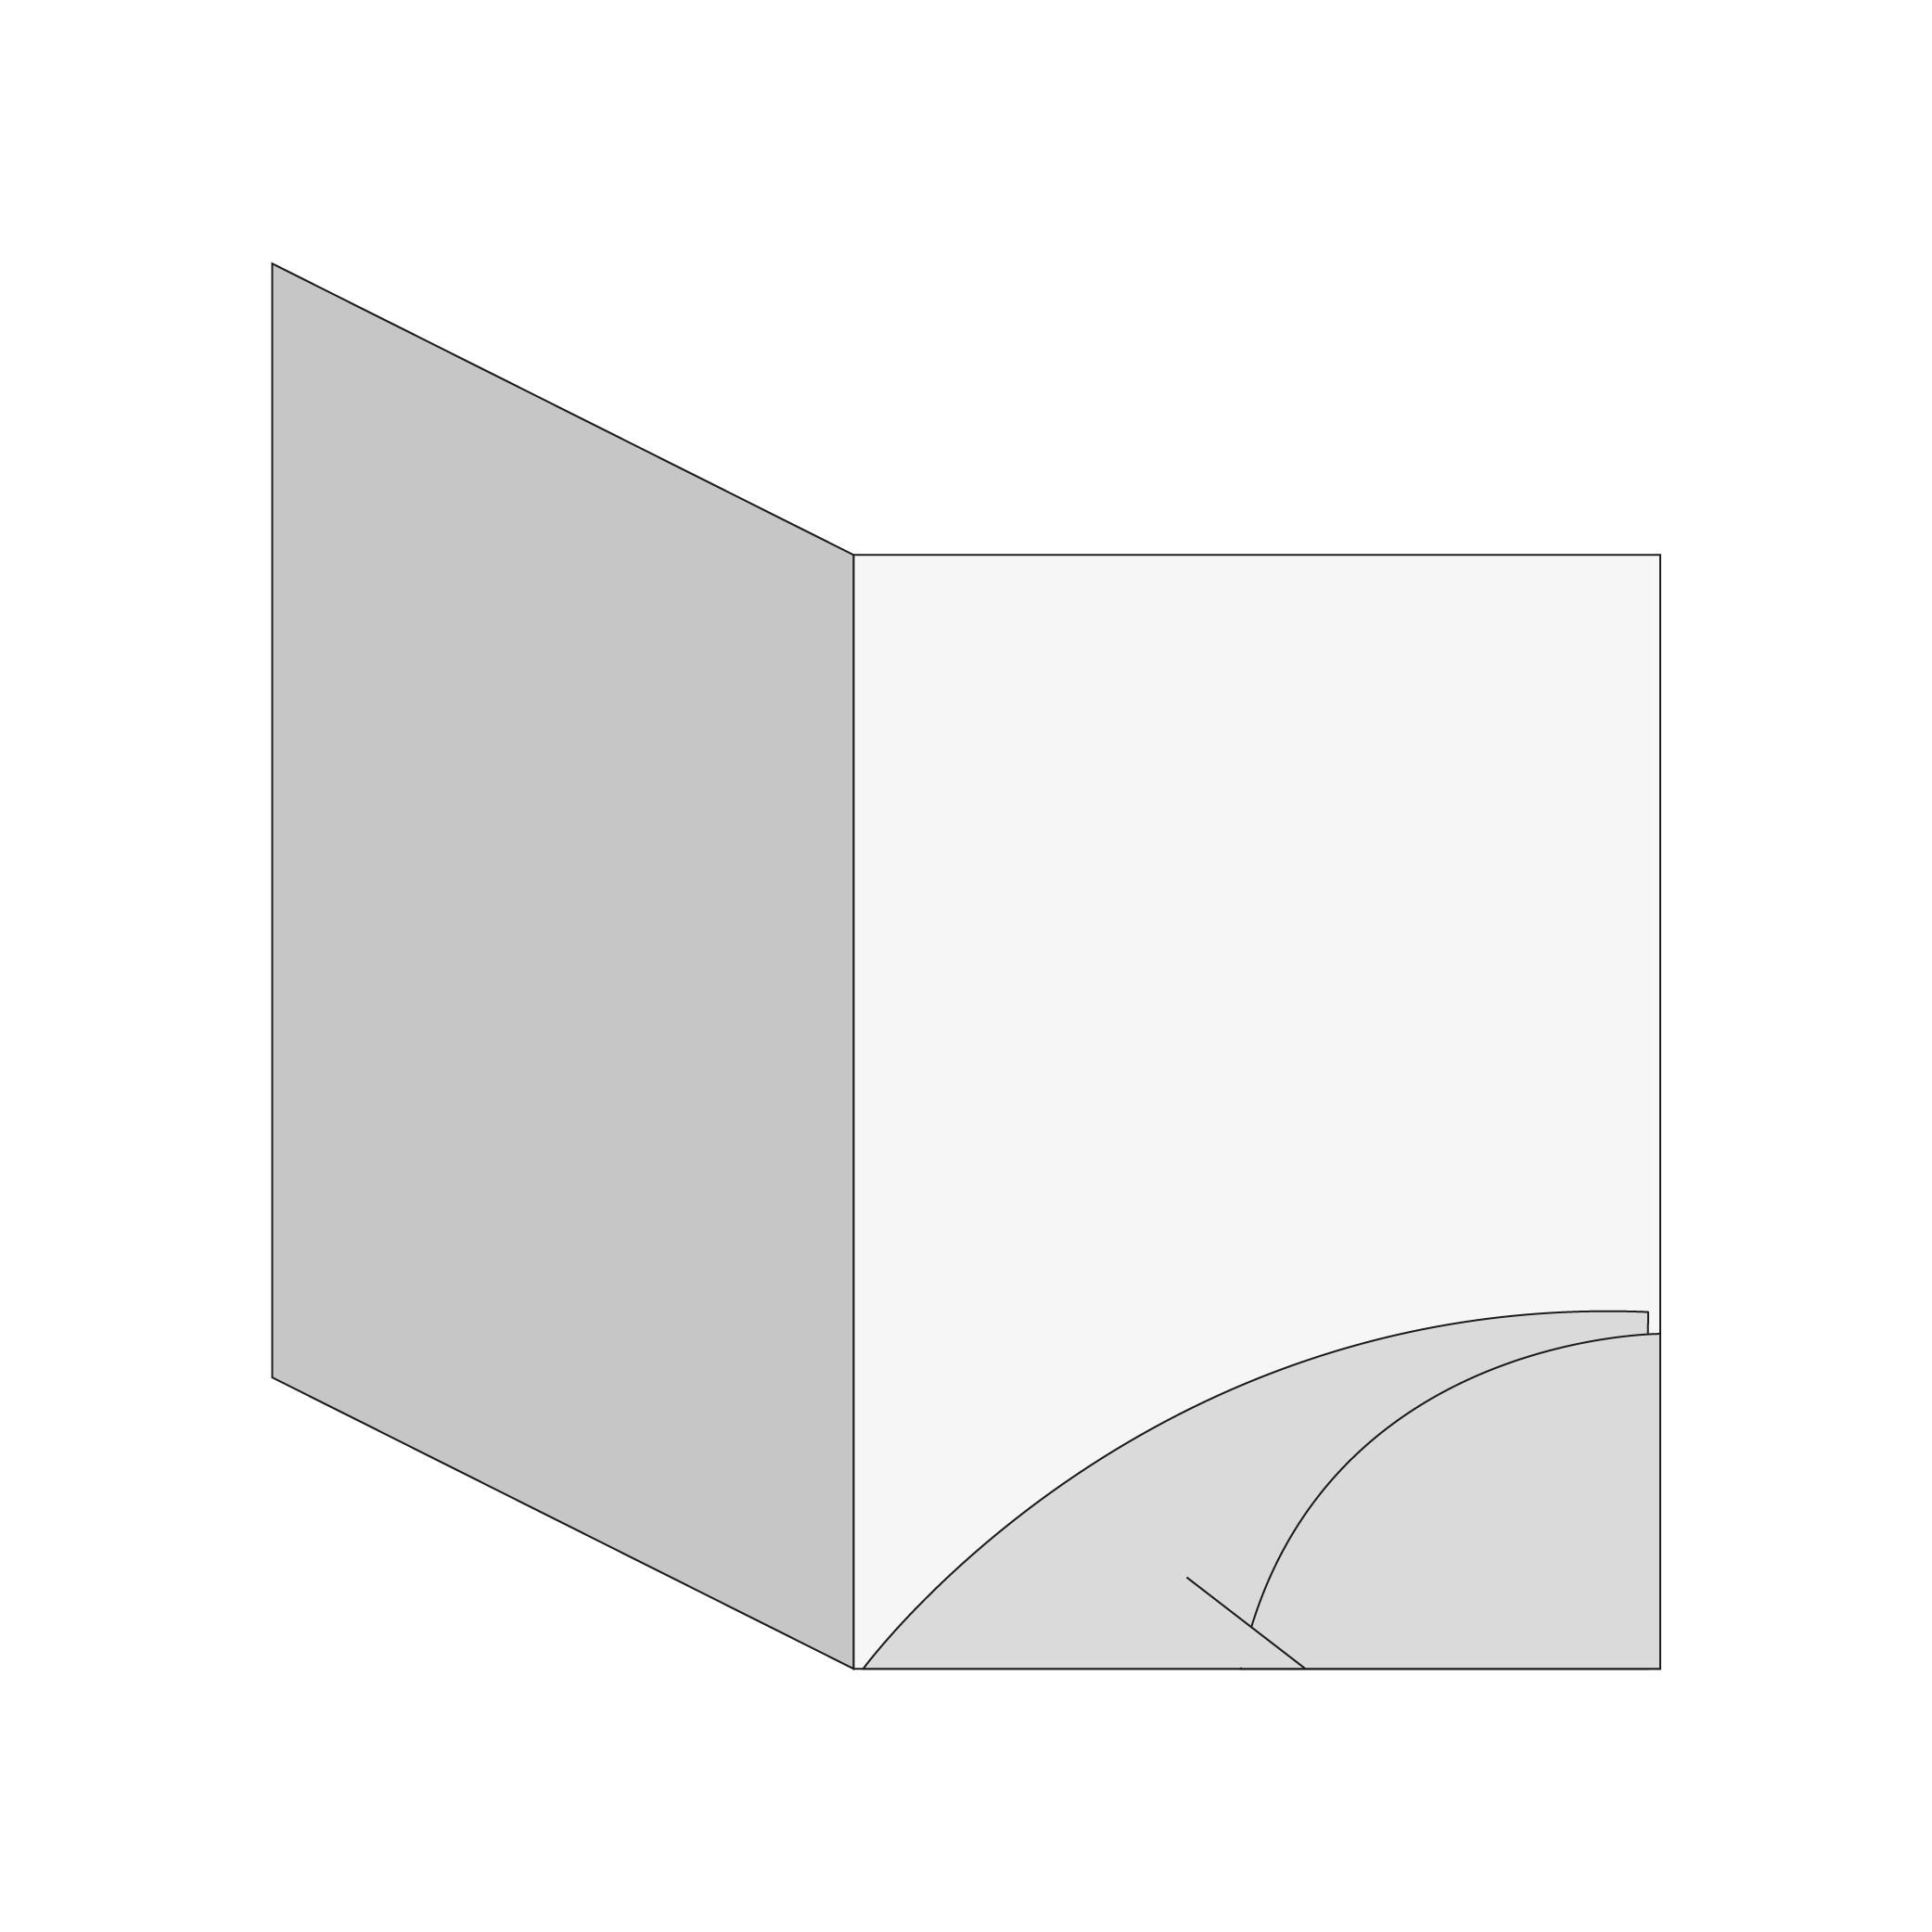 cartella Cartella A4 - 2 lembi (modello C)